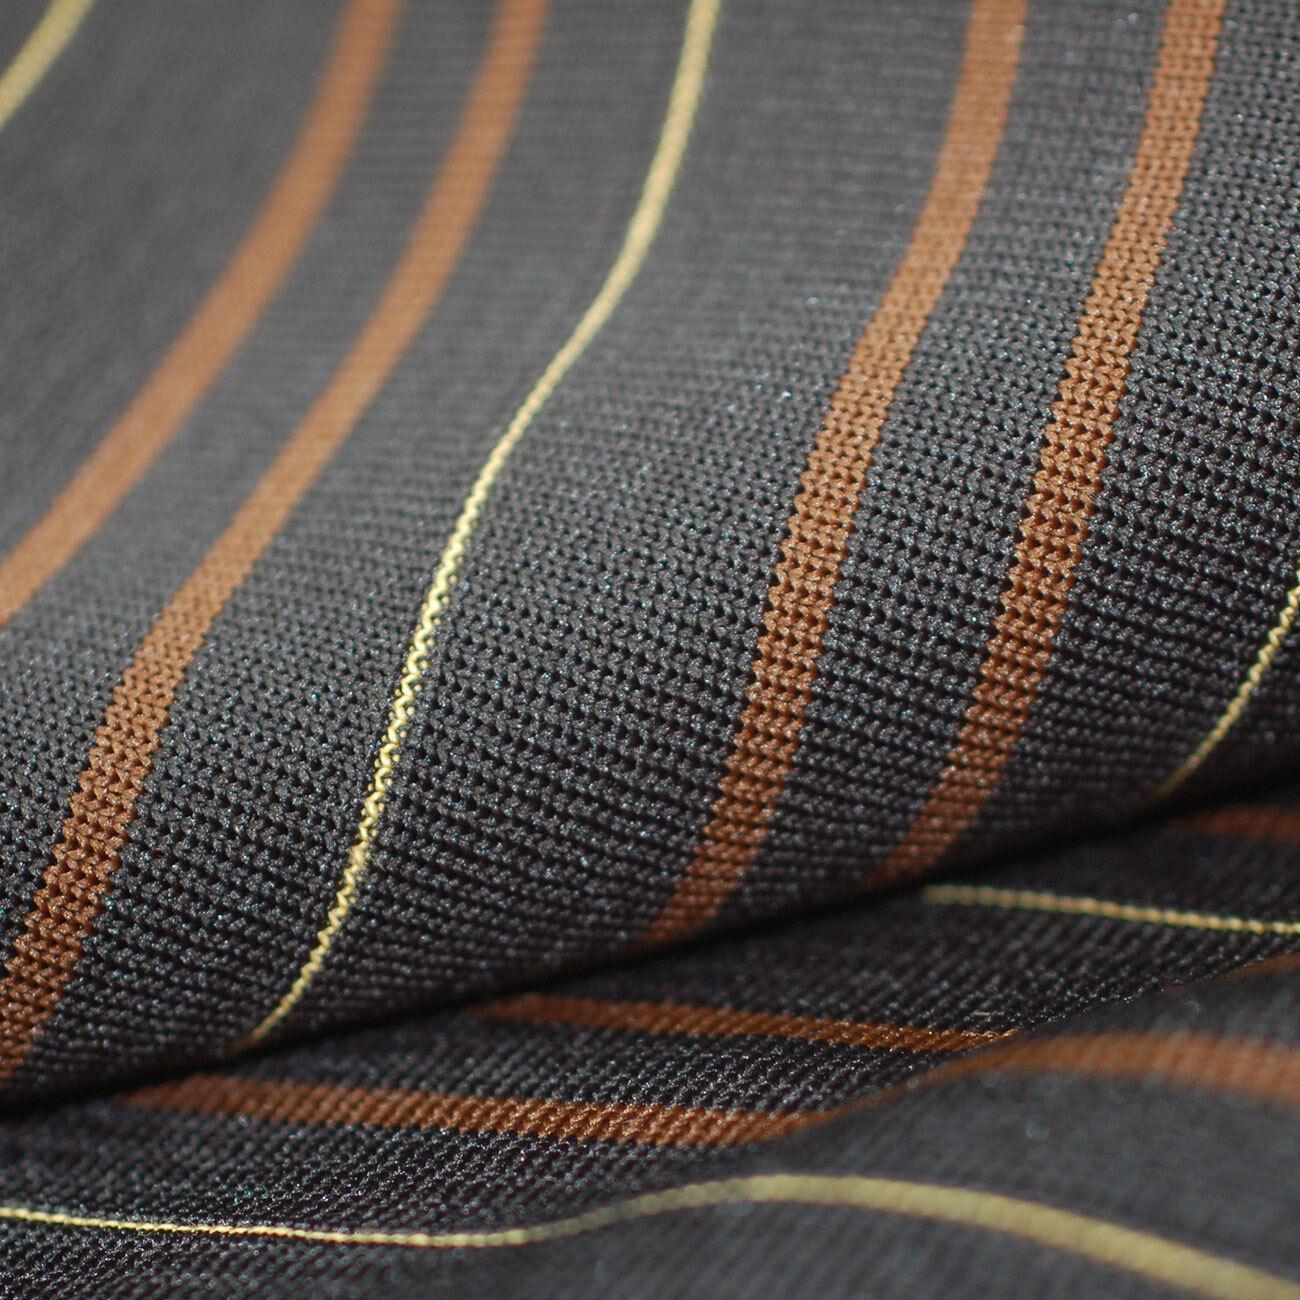 Neotrims poliéster elástico fuerte Durable Resistente Knit Rib Tela corte